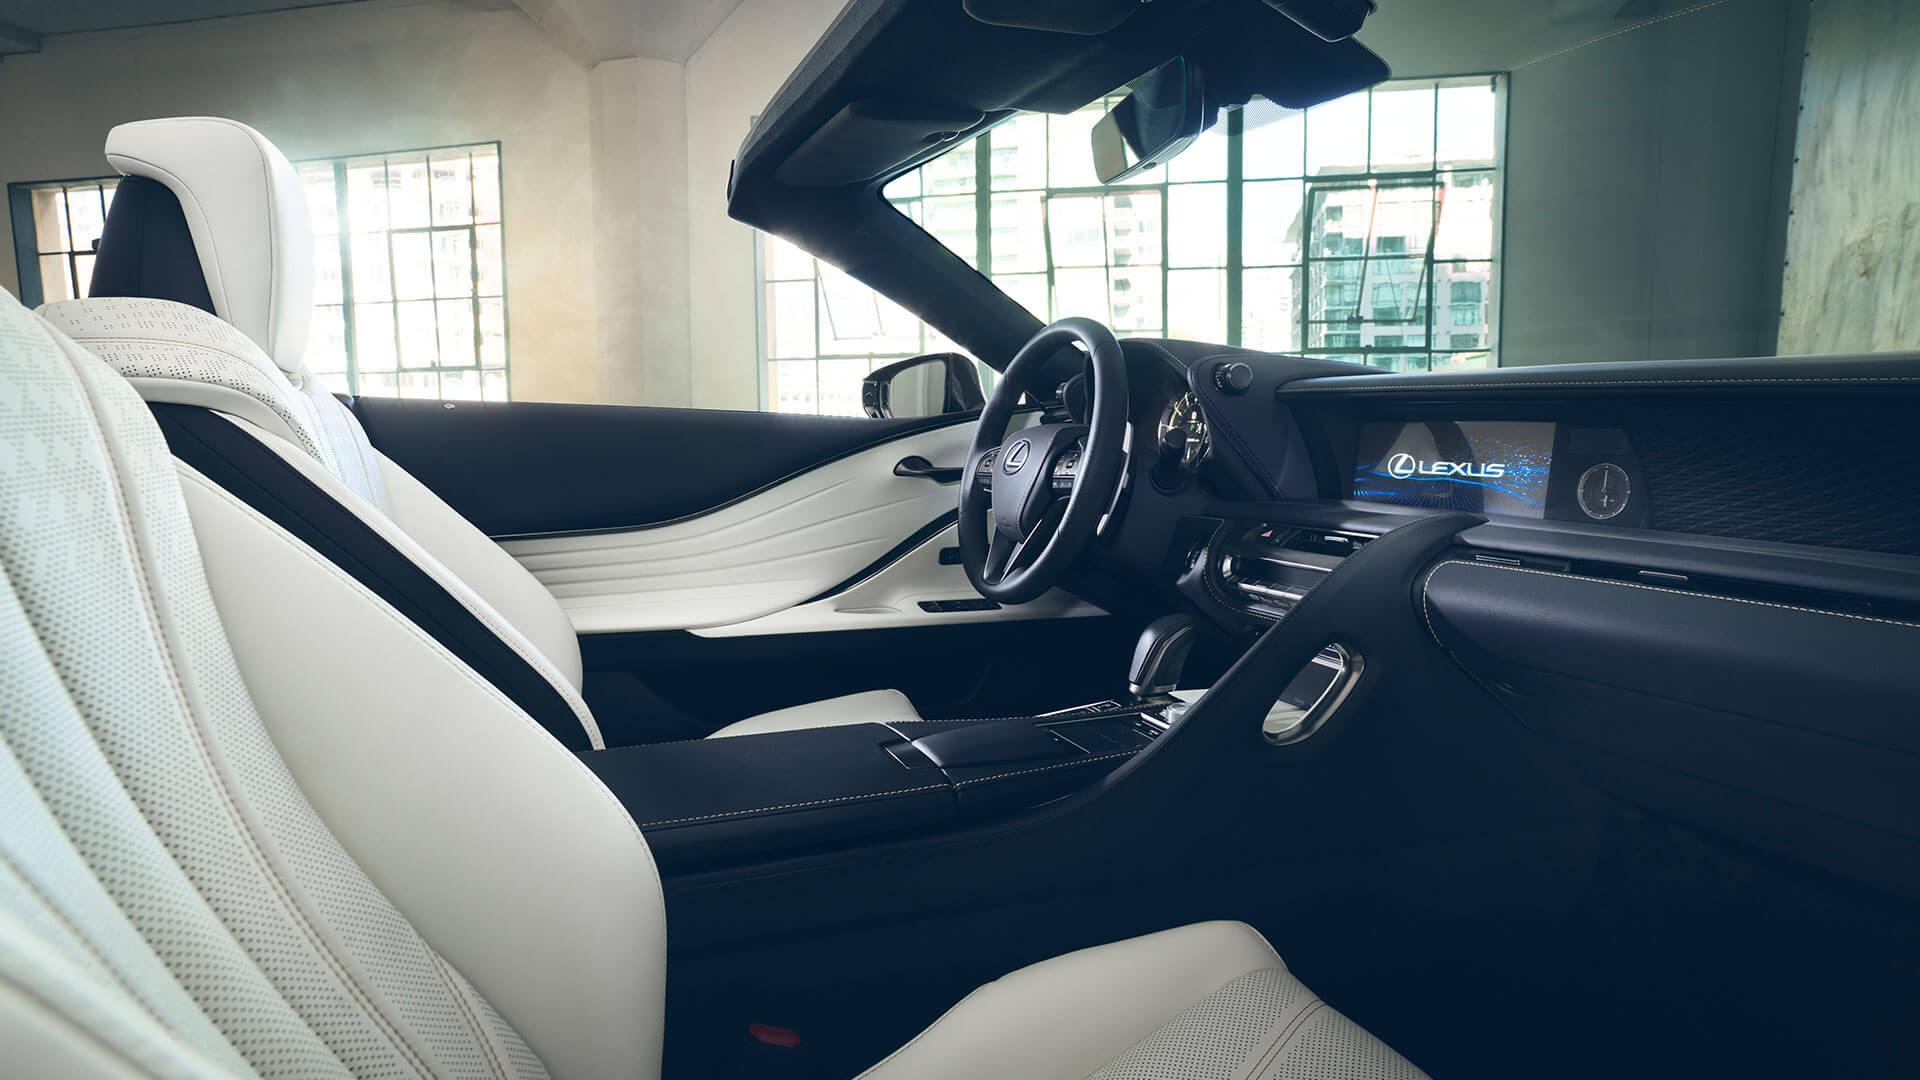 2019 lexus lc convertible gallery 03